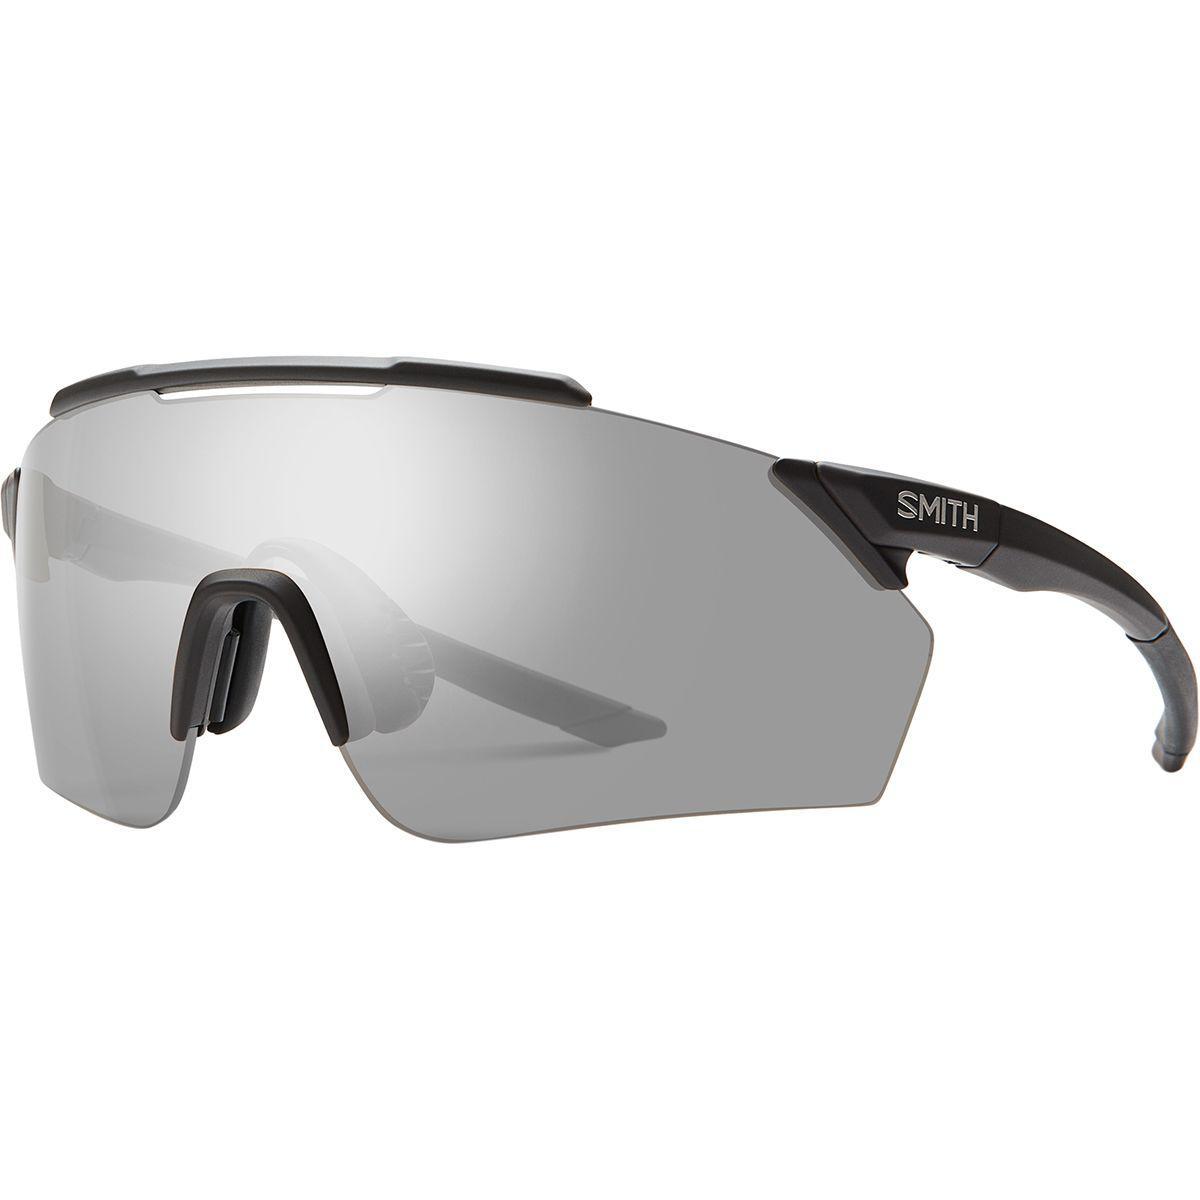 47610a46c8 Smith - Multicolor Ruckus Chromapop Sunglasses for Men - Lyst. View  fullscreen